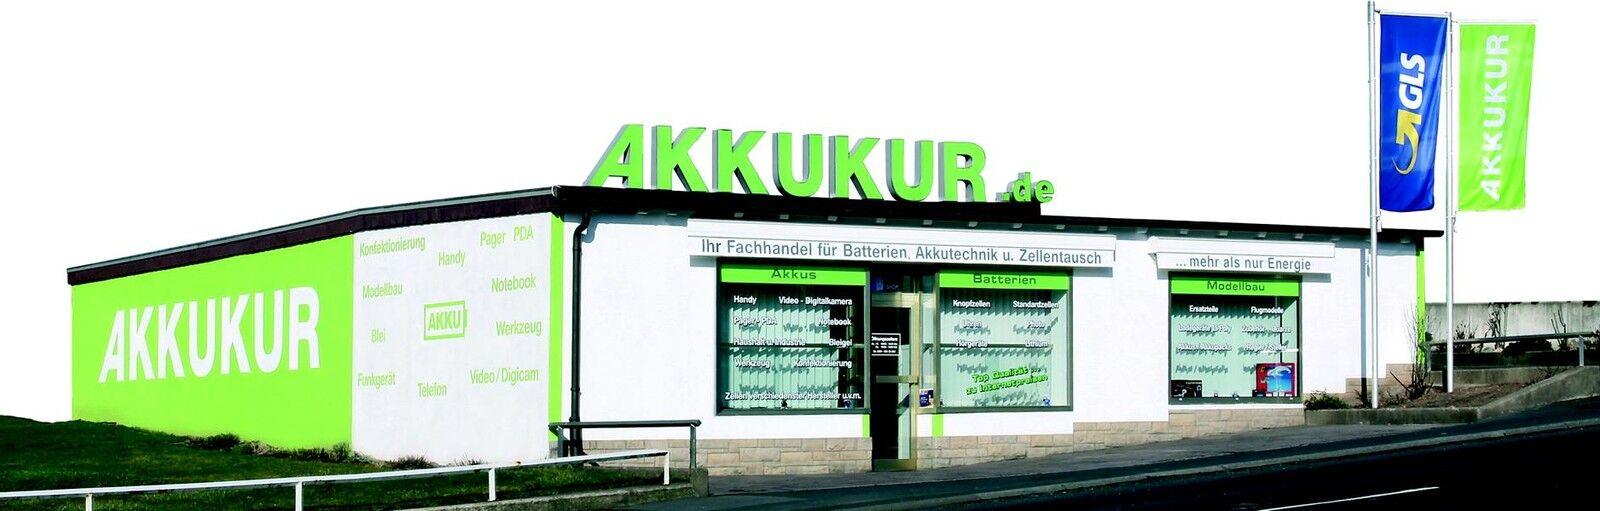 akku-kur